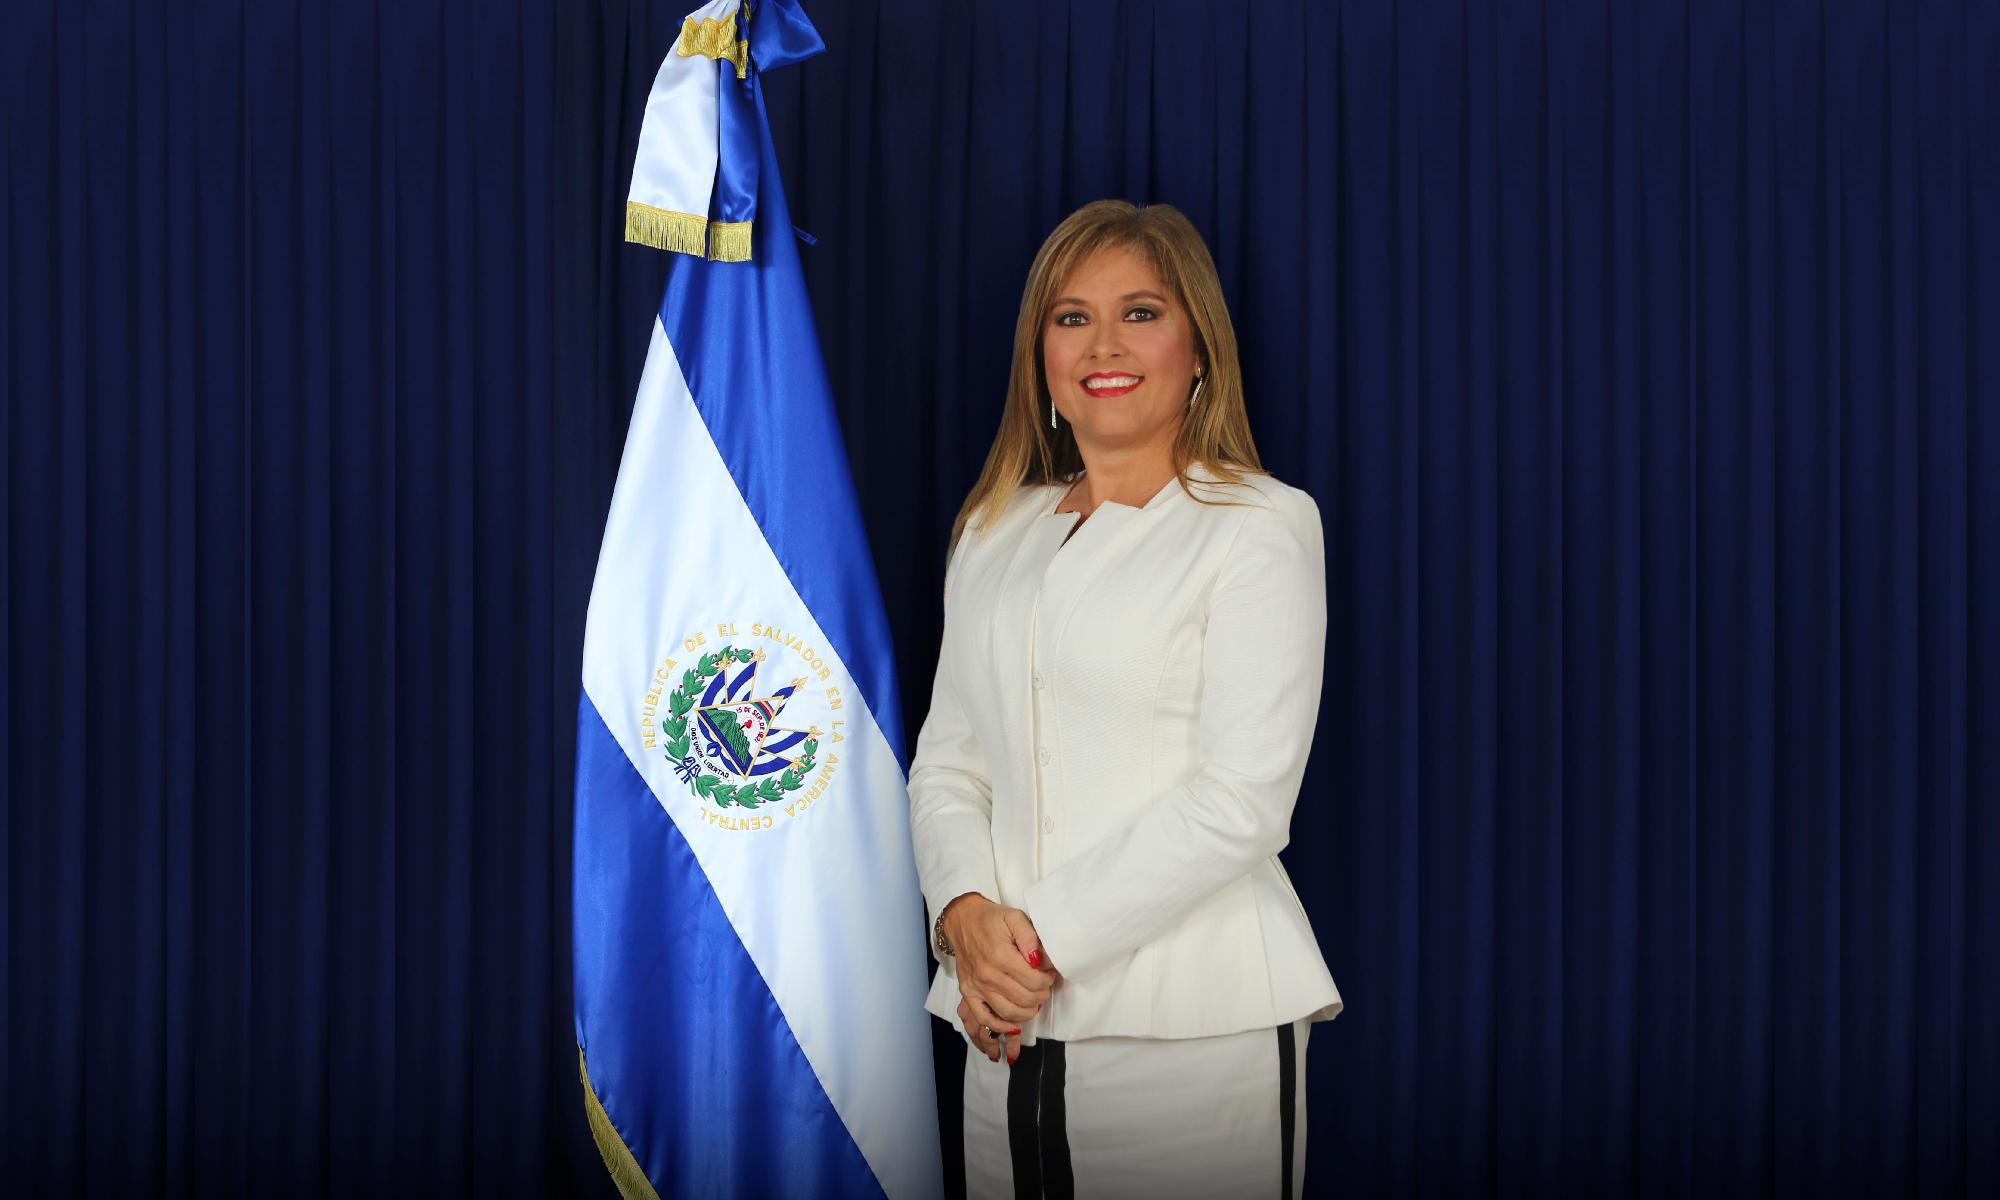 Patty Valdivieso